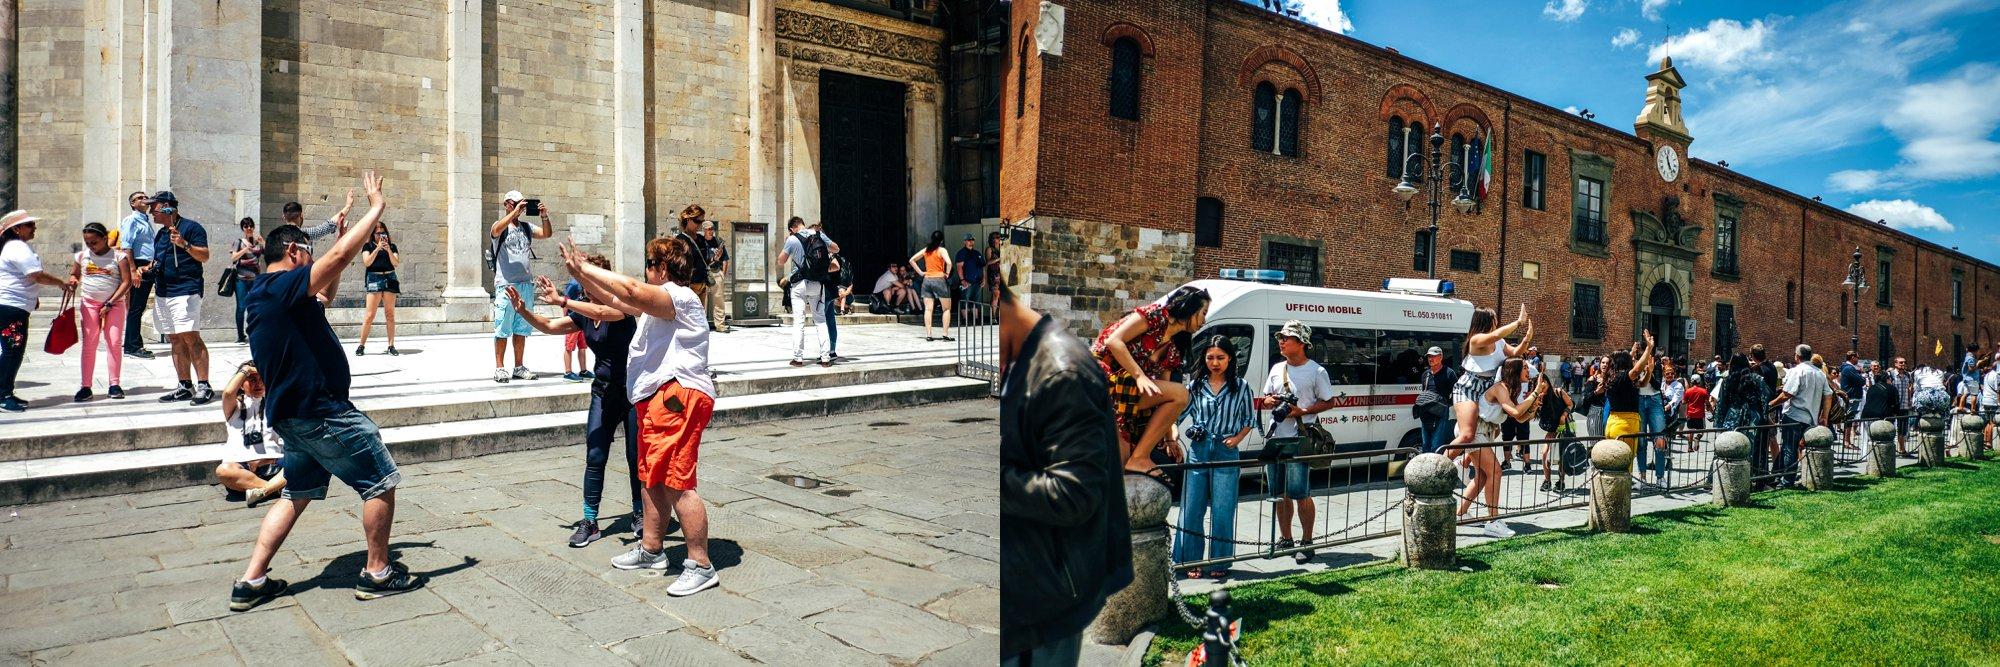 Tourists at Pisa Essex Documentary Travel Wedding Photographer